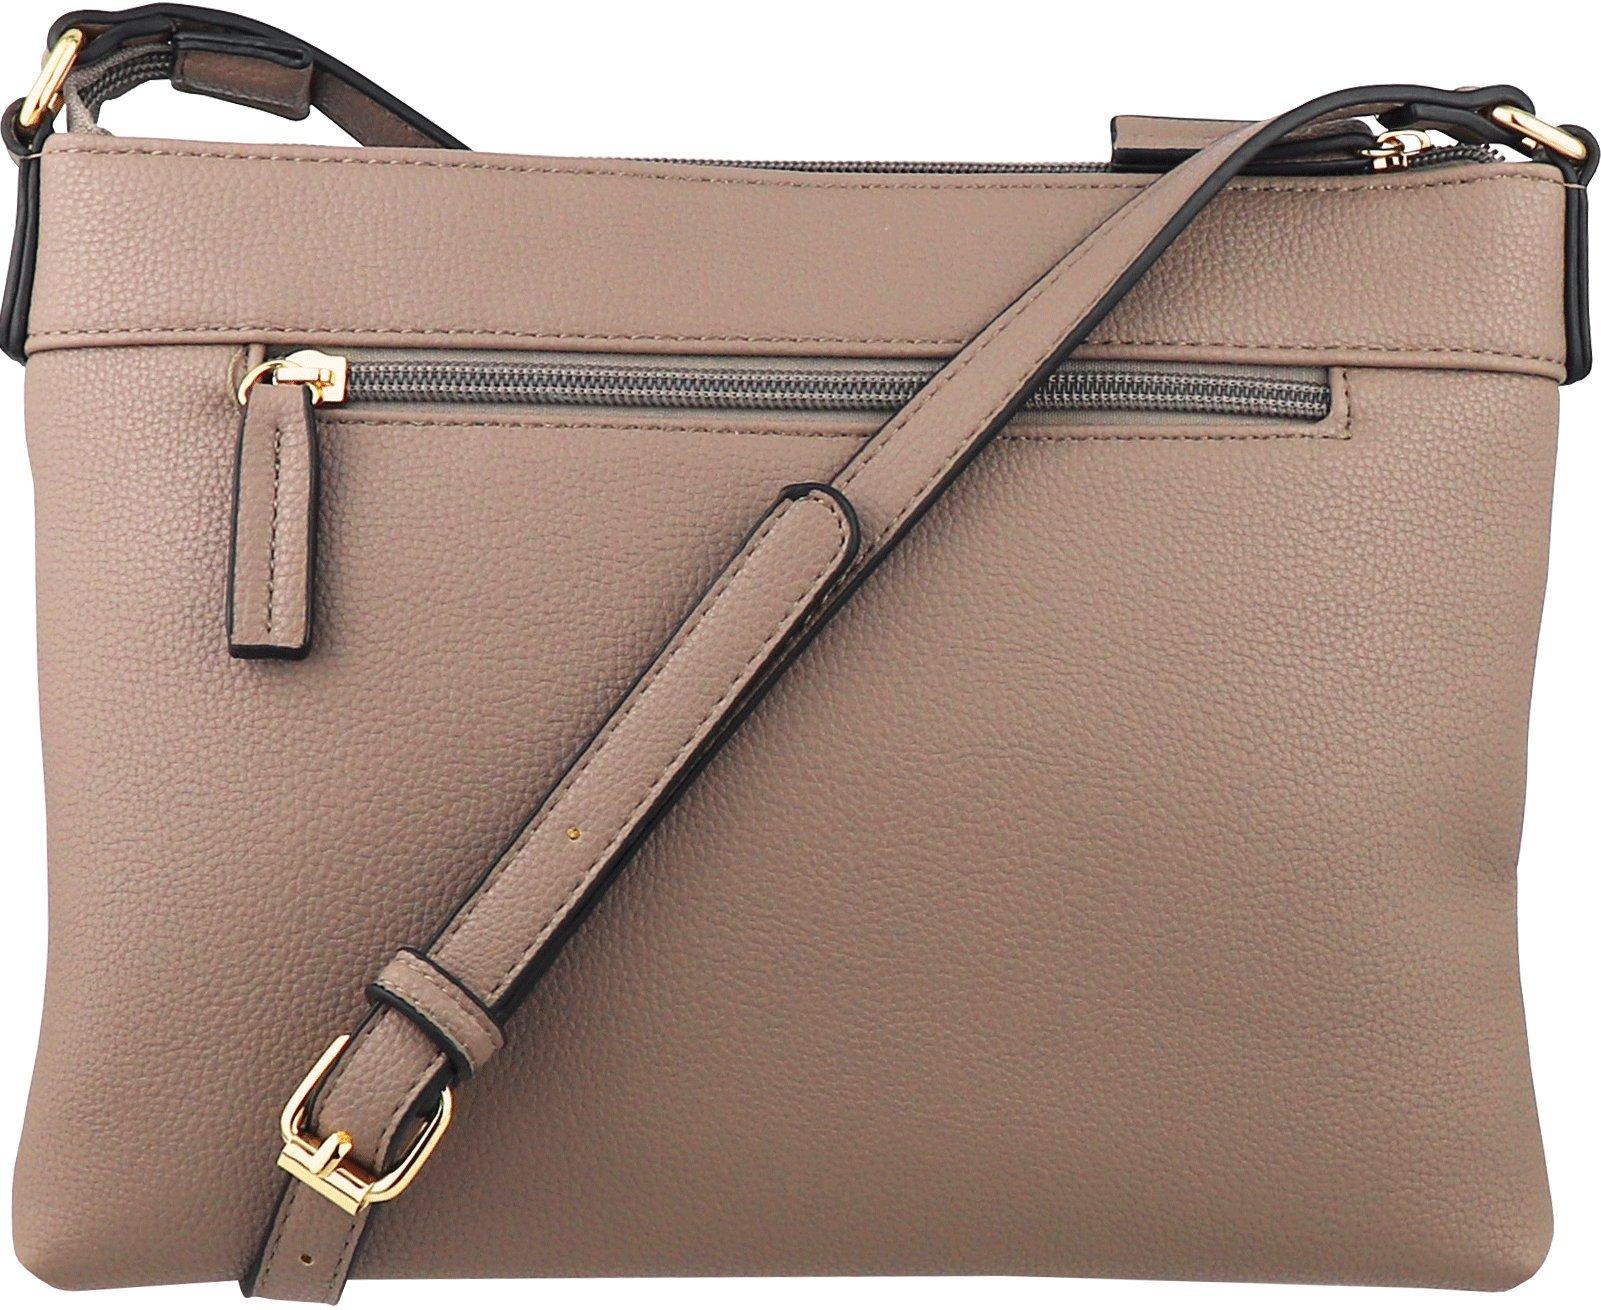 B BRENTANO Vegan Multi-Zipper Crossbody Handbag Purse with Tassel Accents (Nude 1) by B BRENTANO (Image #2)